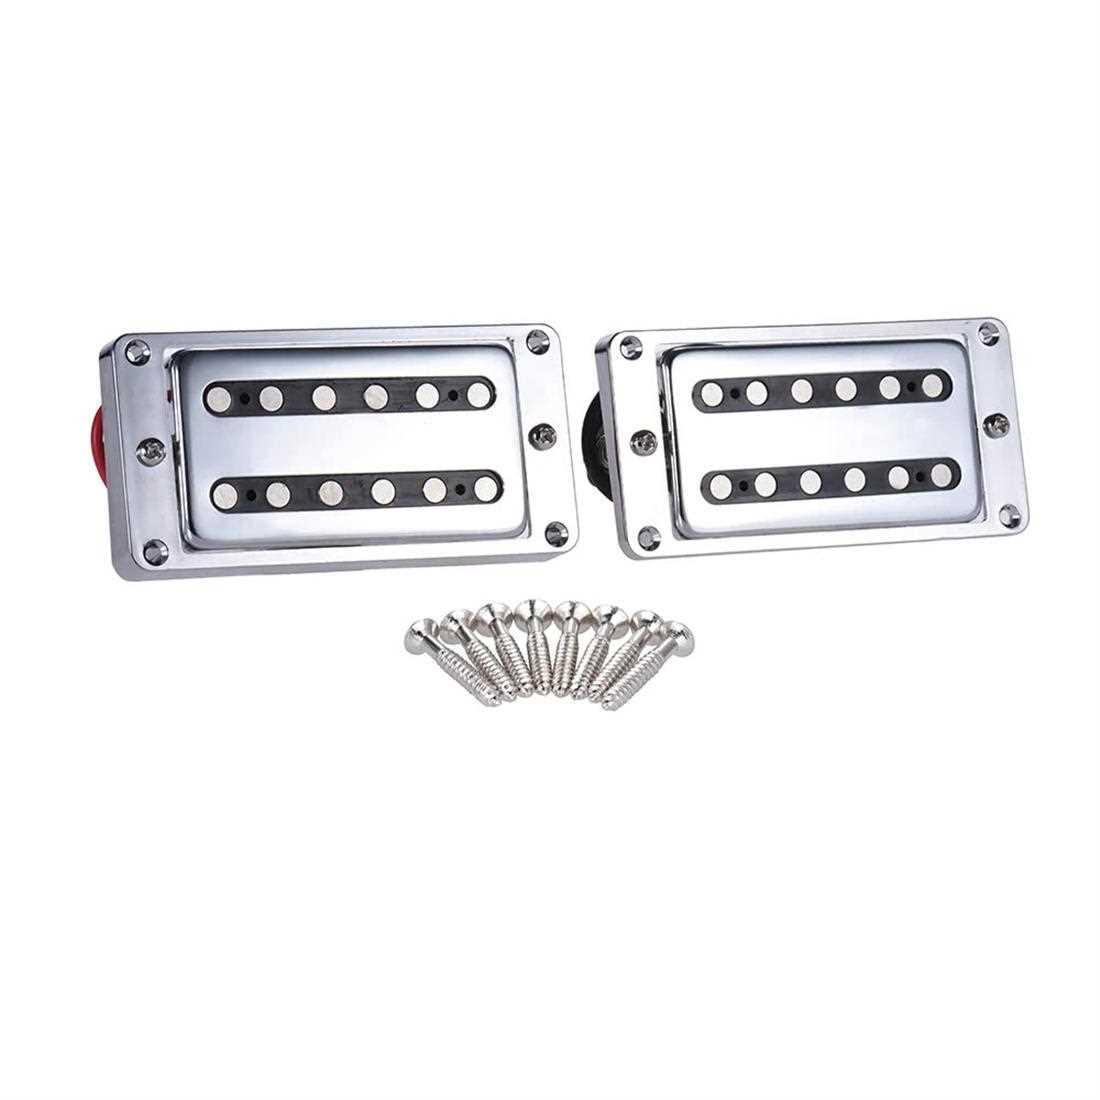 [ MANHATTAN ] 2pcs/set Guitar Sealed Humbucker Pickups Pick-ups Dual Coil for LP Electric Guitars with Mounting Screws (Silver) Malaysia